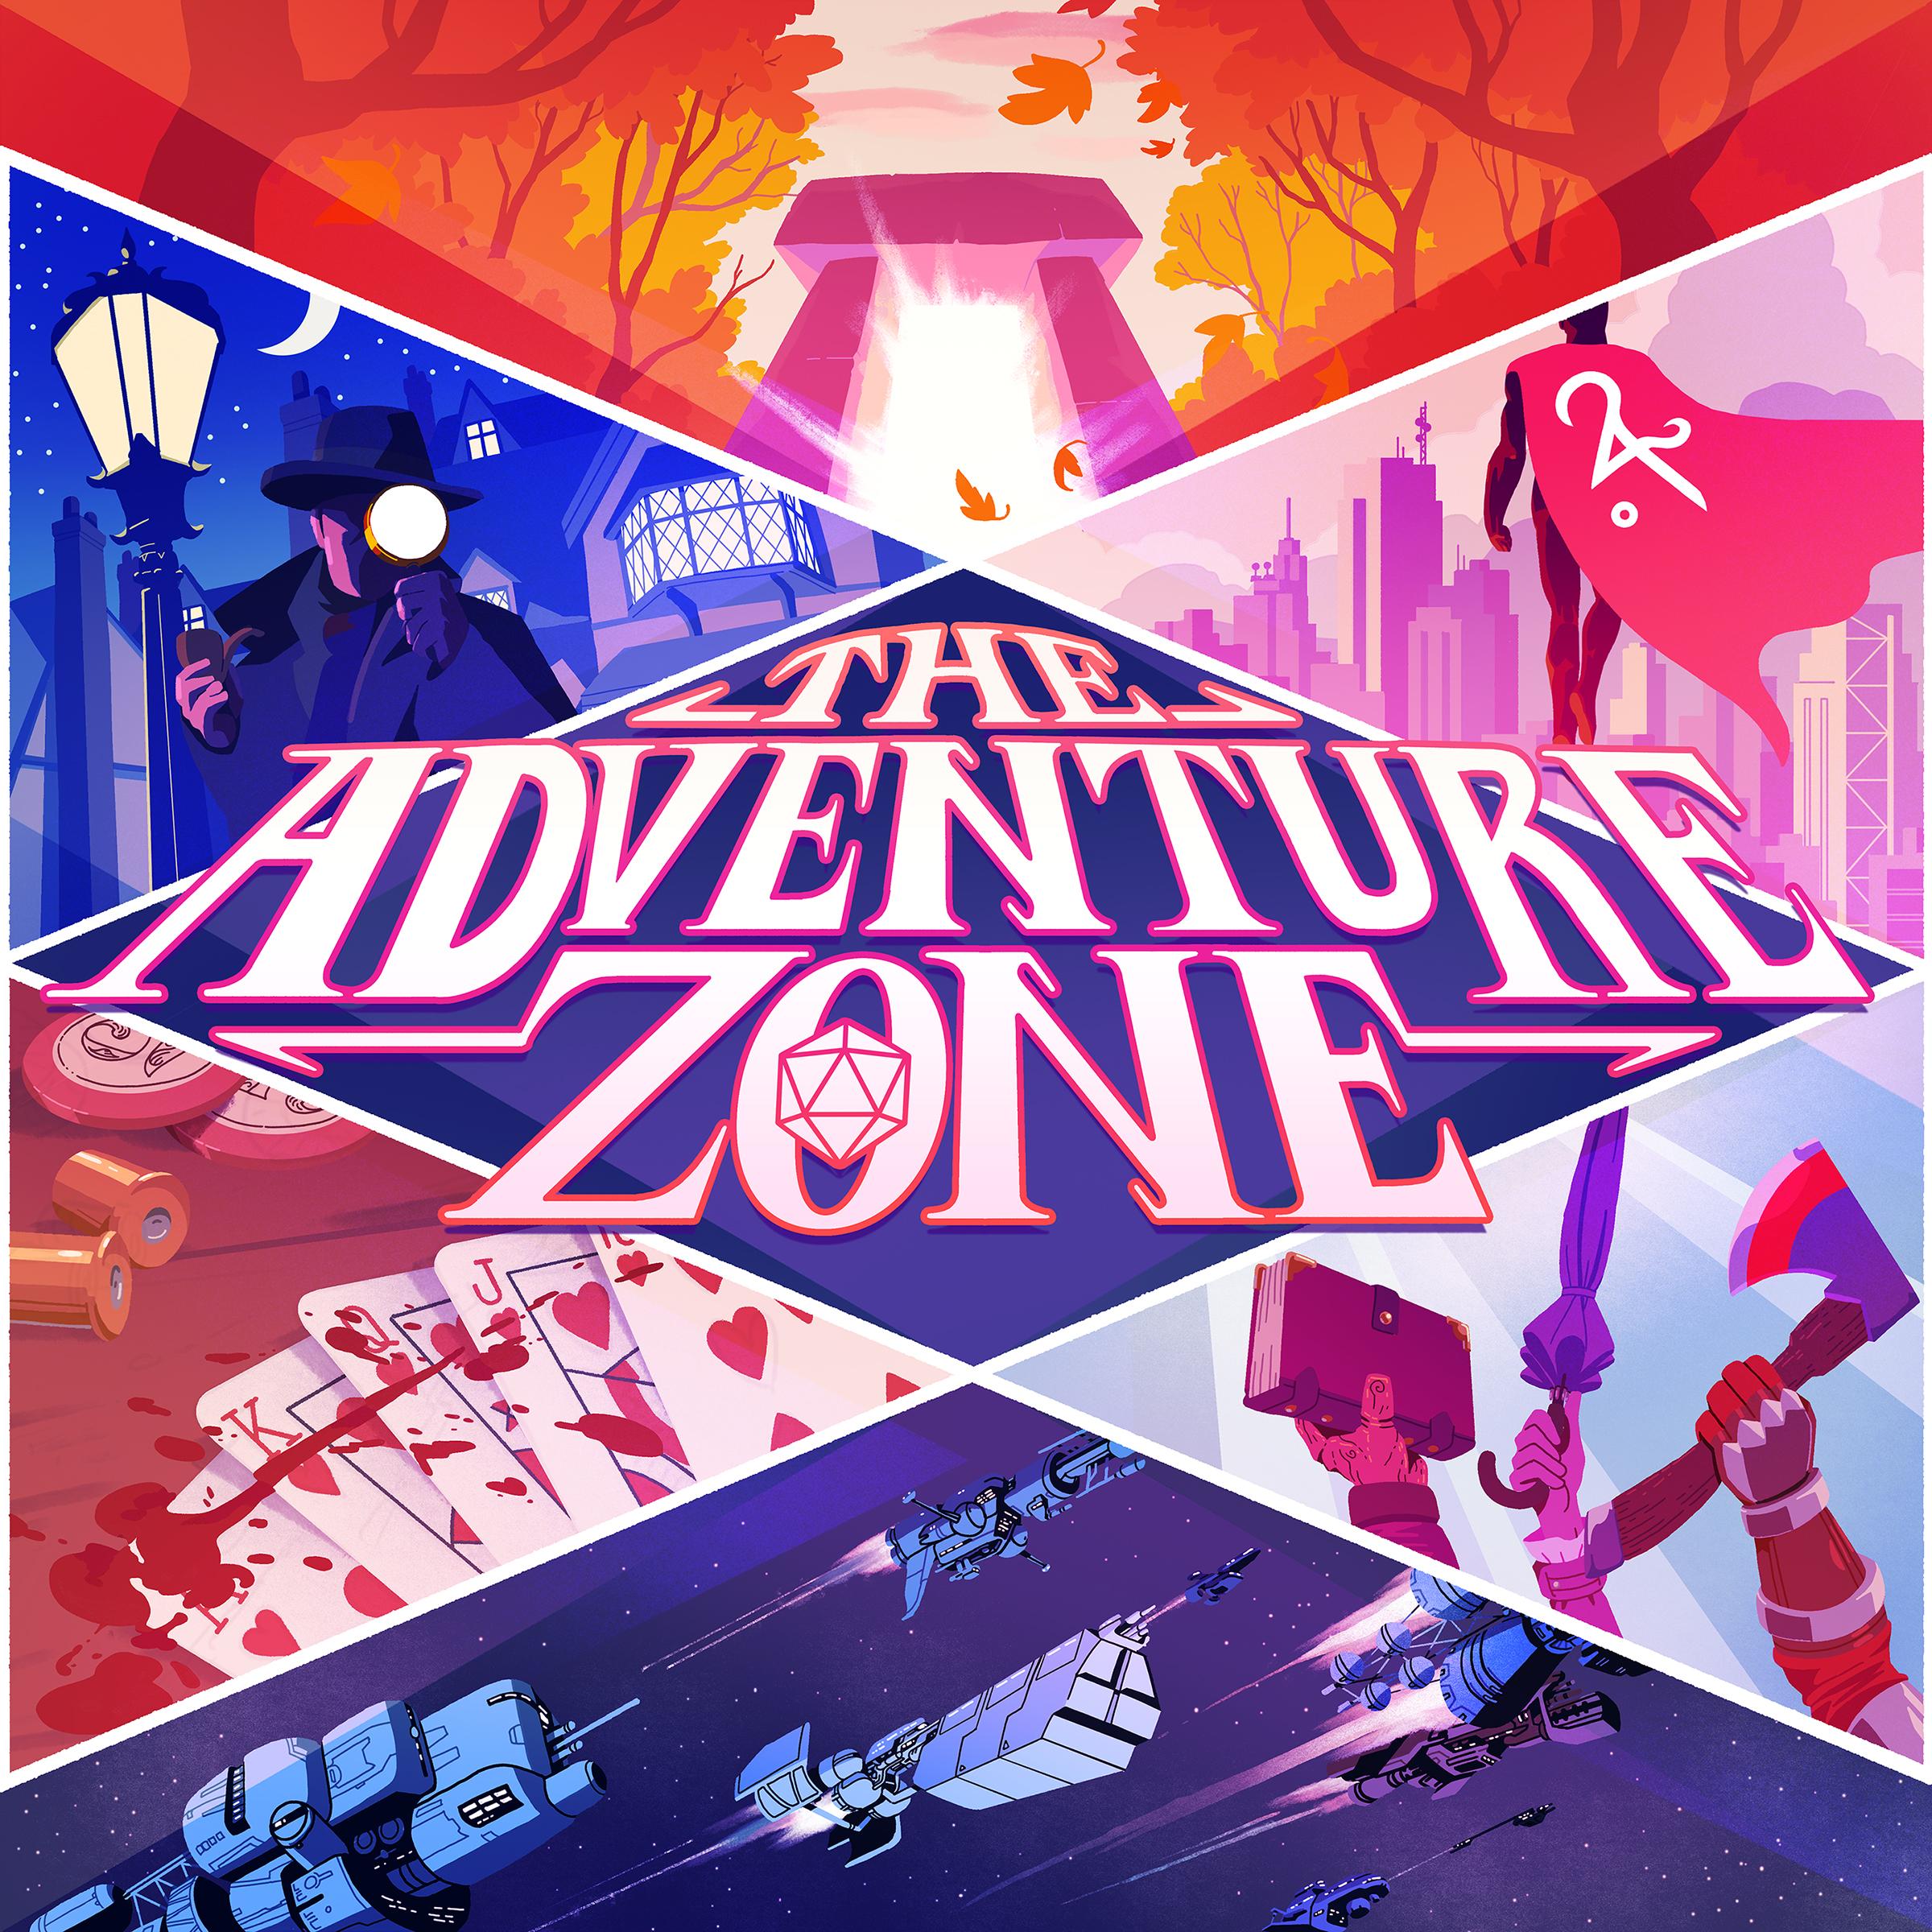 The Adventure Zone Listen Free On Castbox